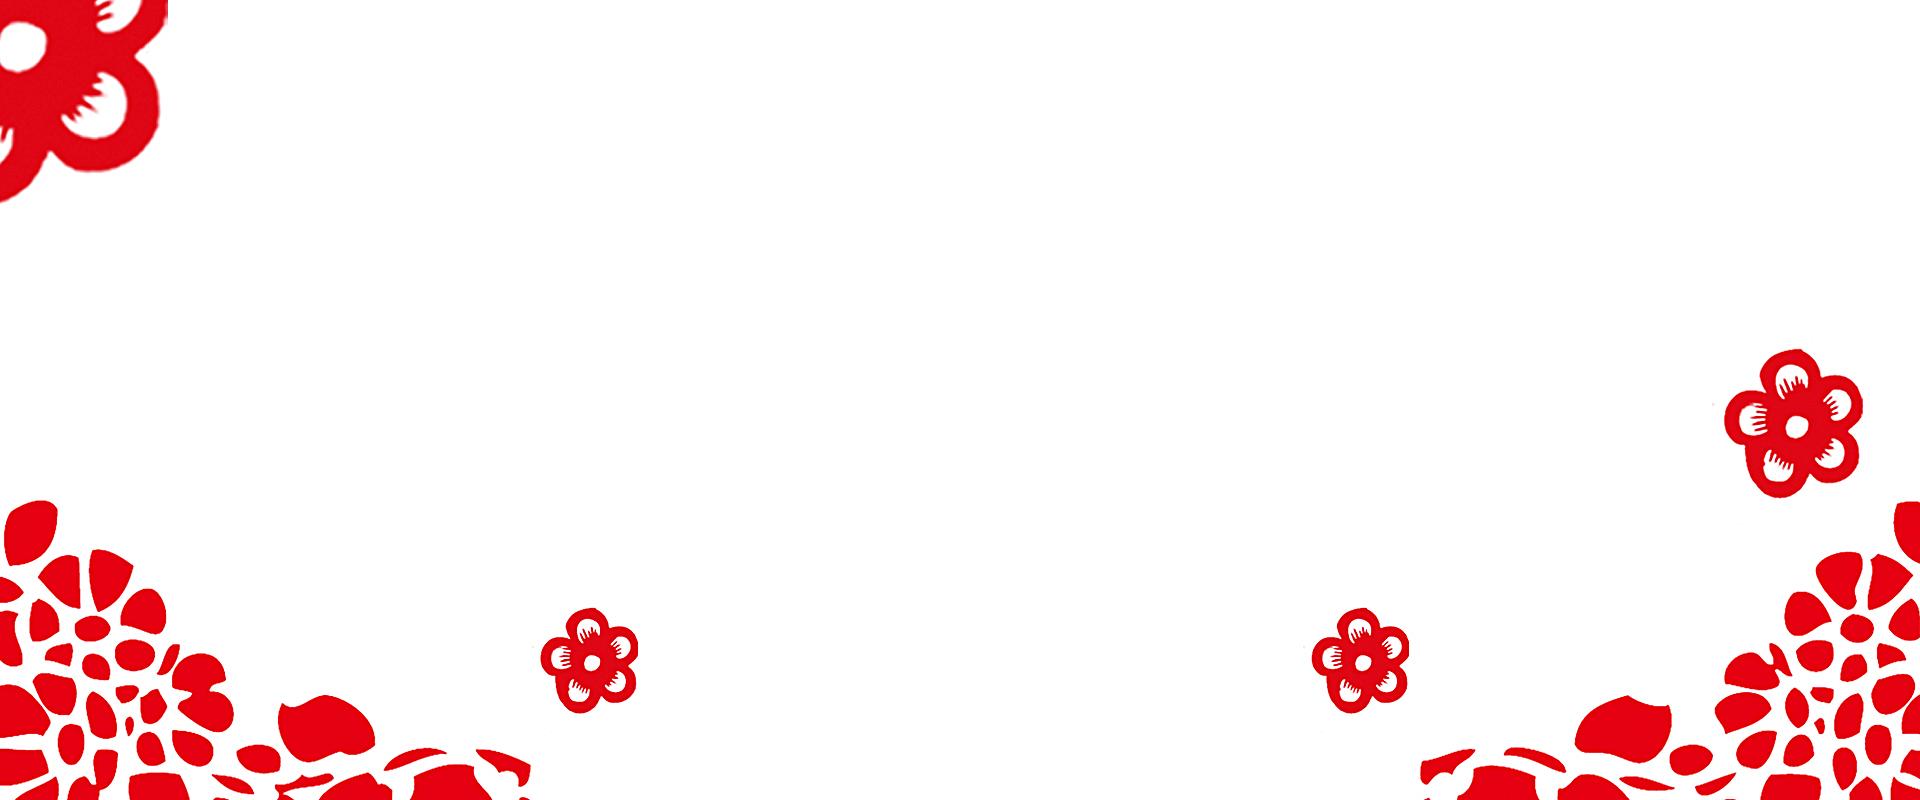 01m 尺寸:1920*800 90设计提供红色 喜庆设计素材下载,高清psd格式.